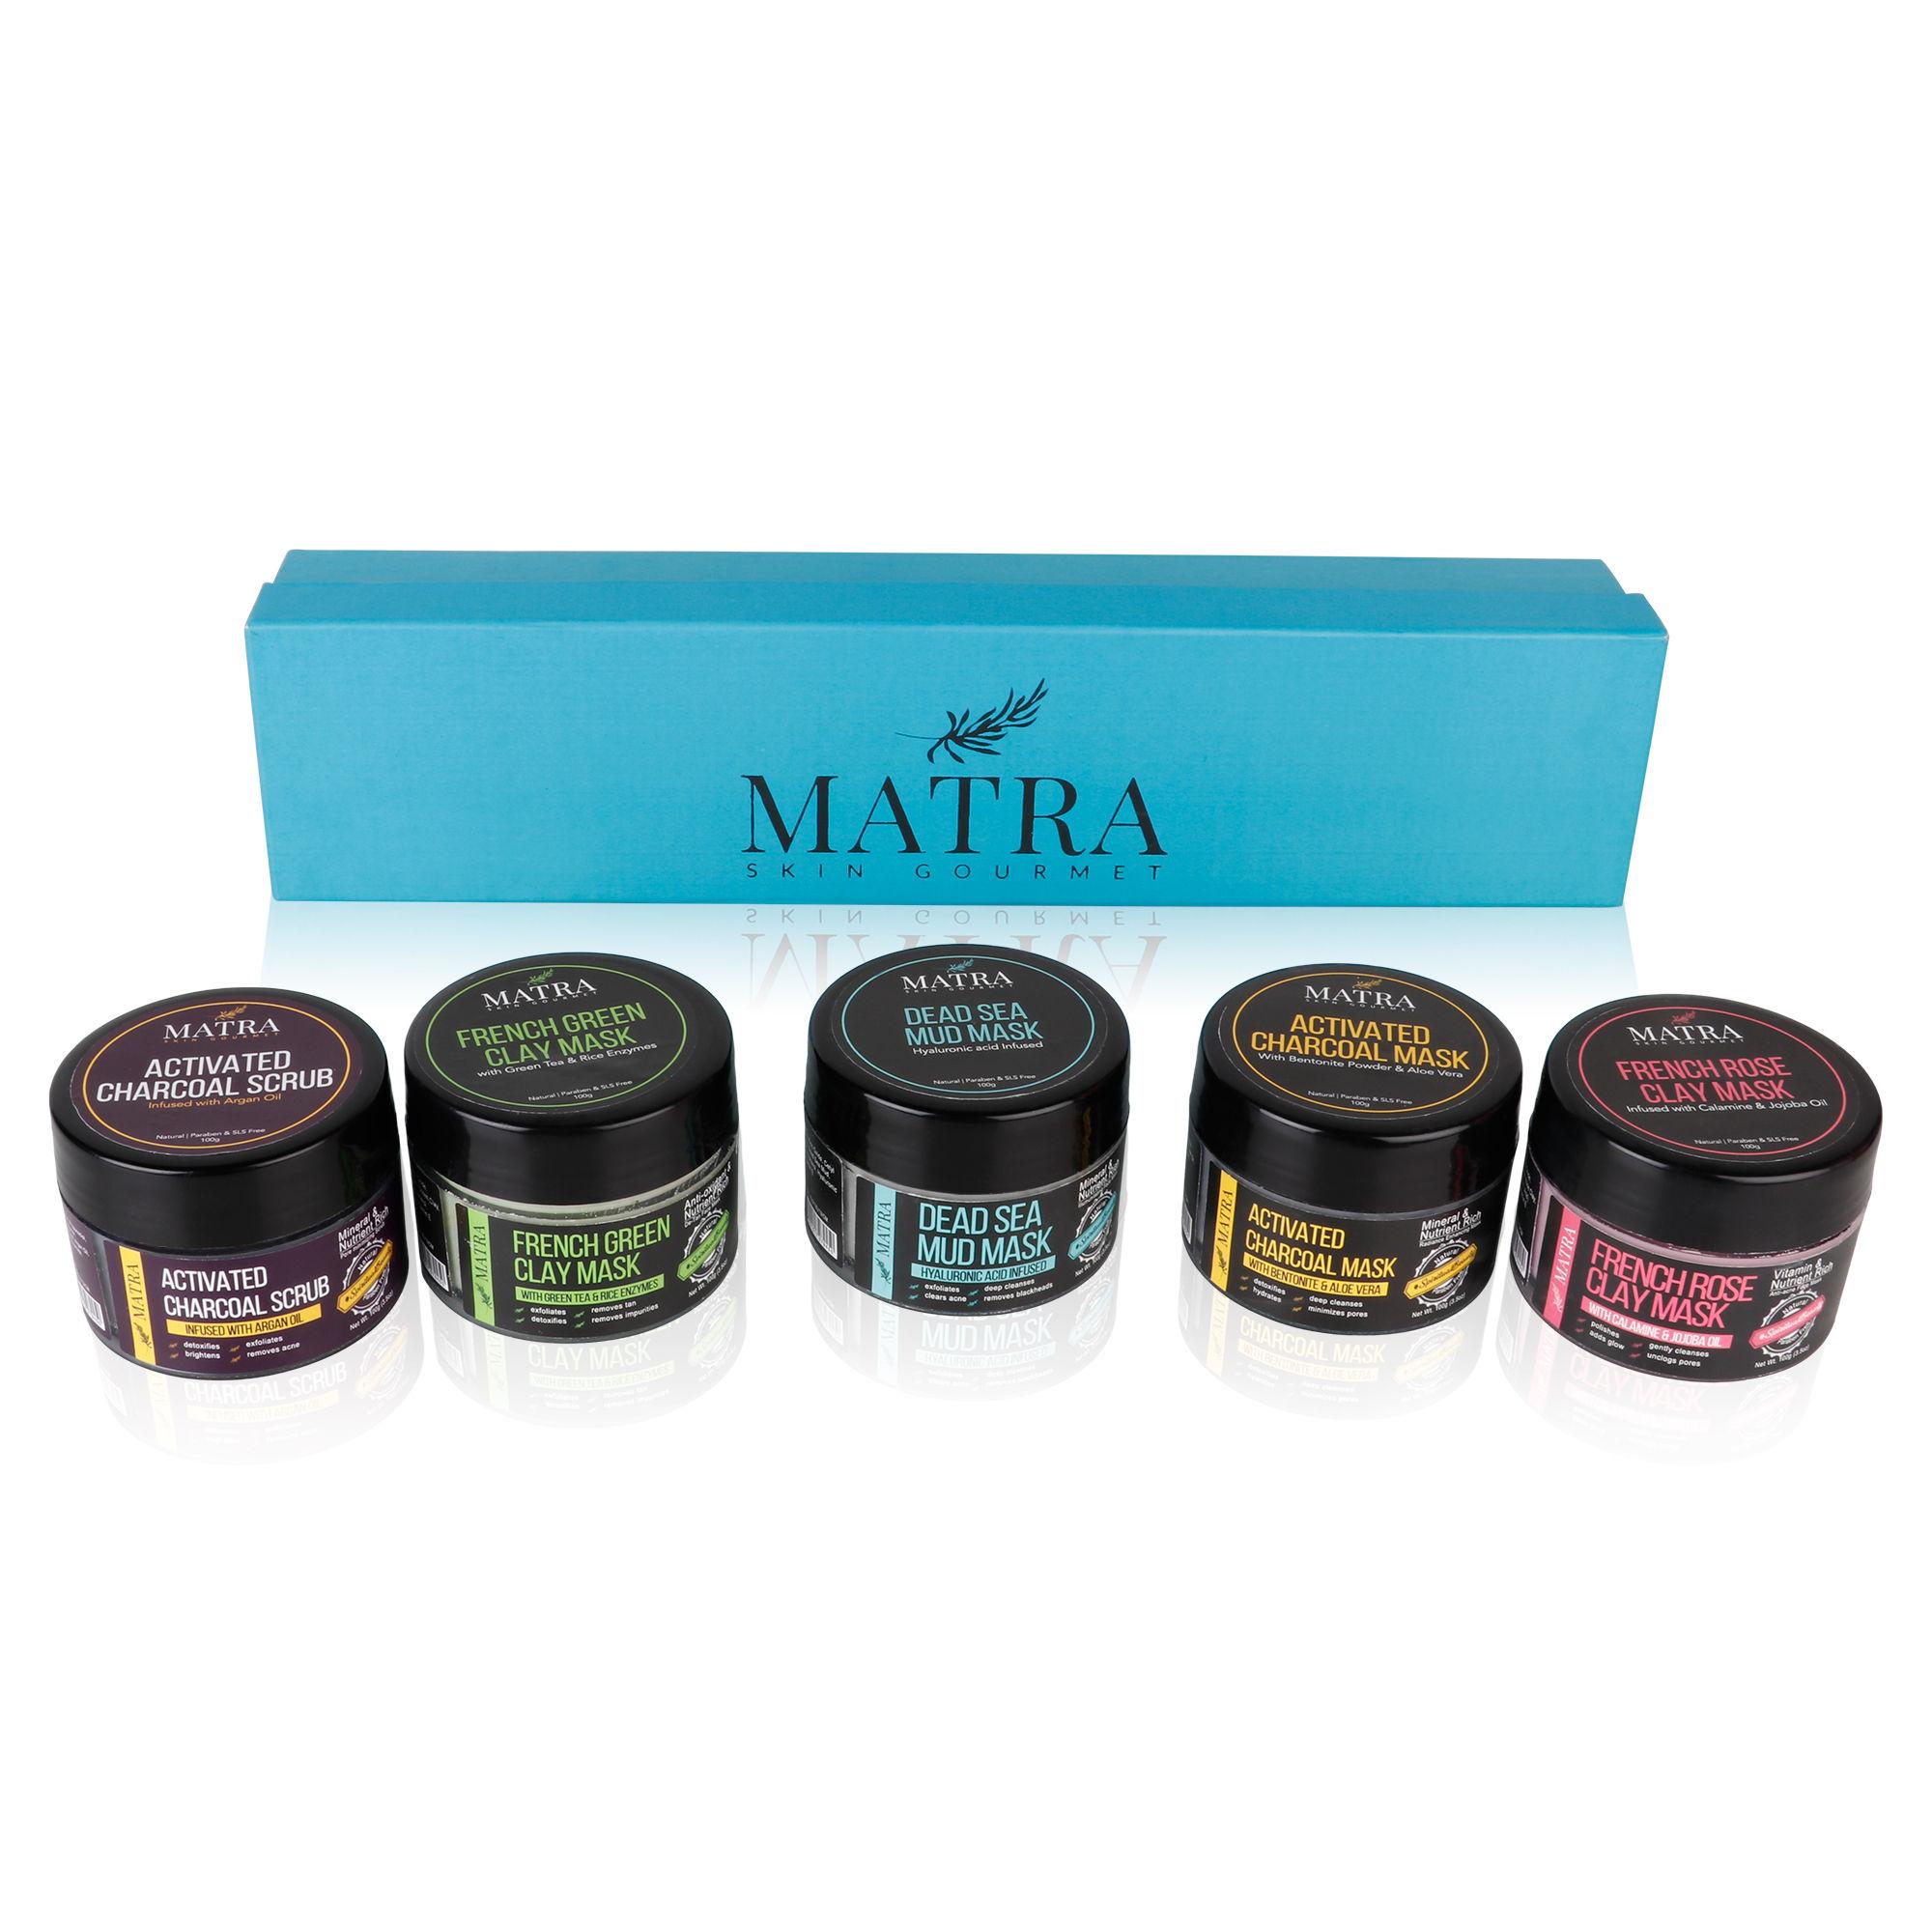 Matra Holistic Wellness Luxury Skincare Hamper Gift Set Buy Matra Holistic Wellness Luxury Skincare Hamper Gift Set Online At Best Price In India Nykaa